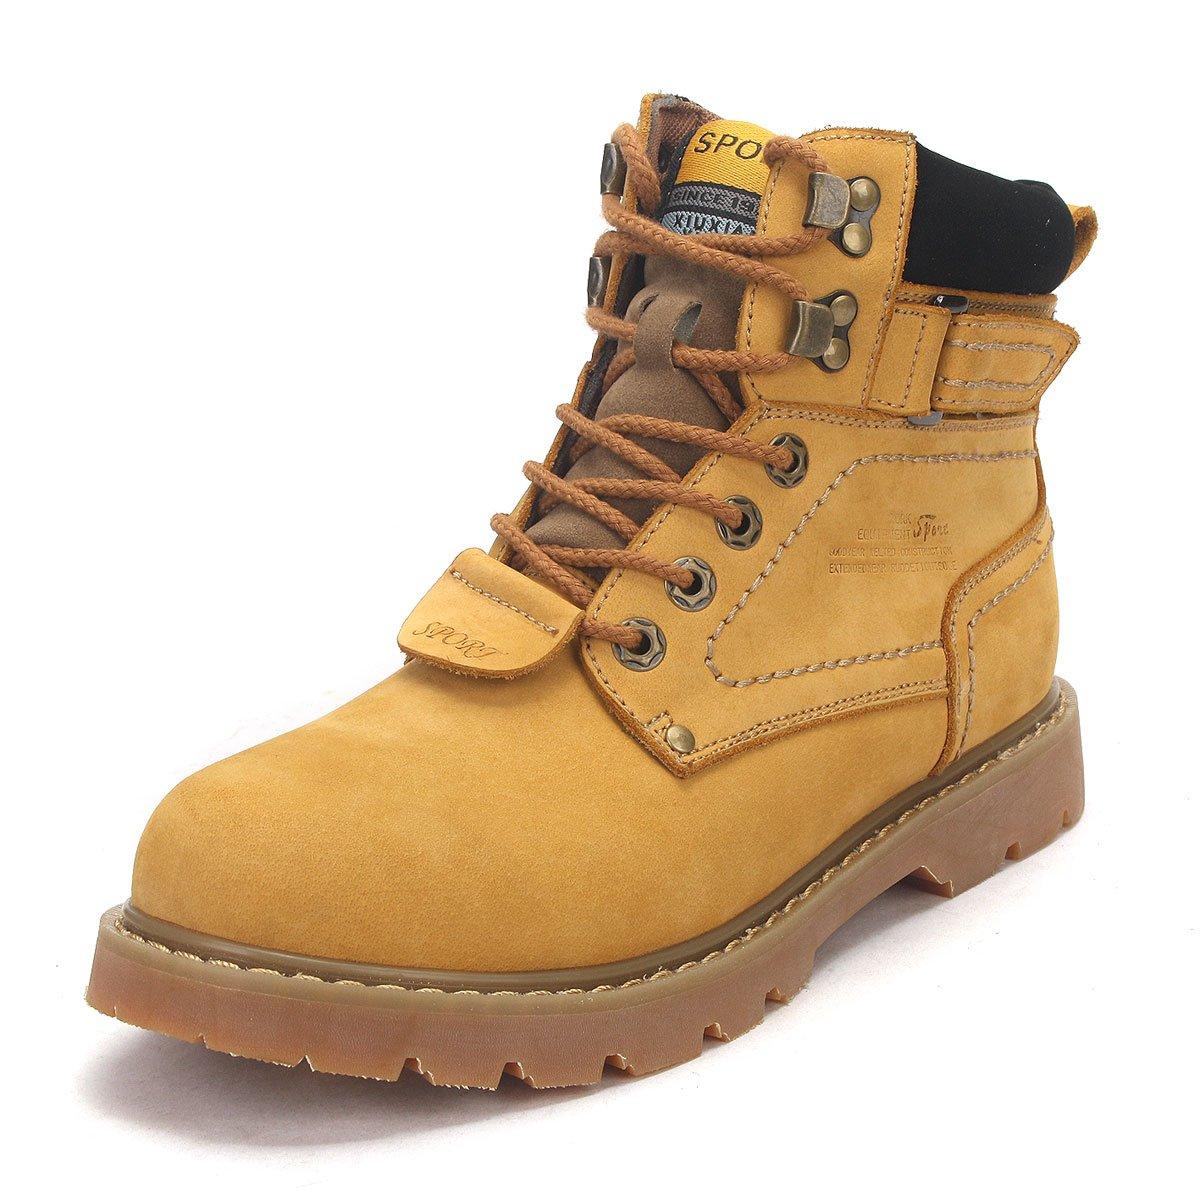 Yellow Hiking Boots for Women Fashion